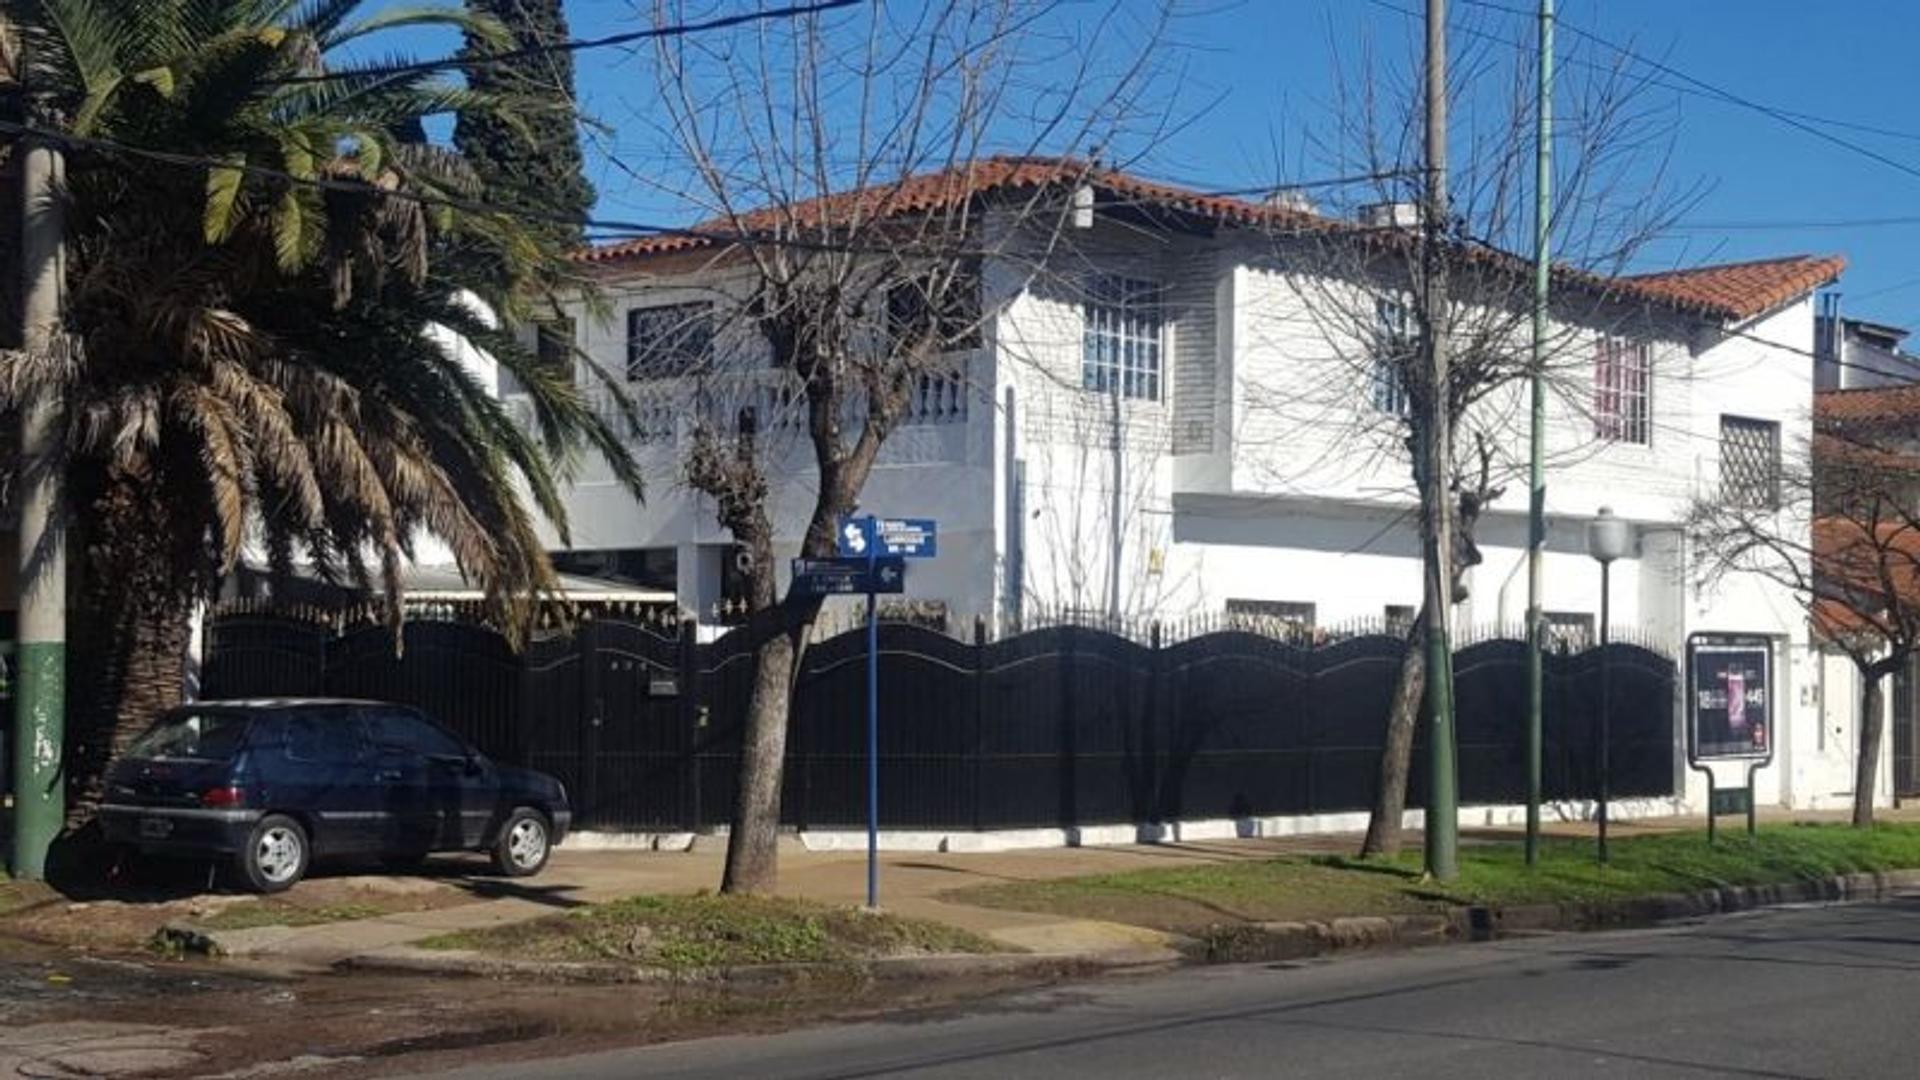 venta casa barrio residencial excelente, larroque 900 banfie